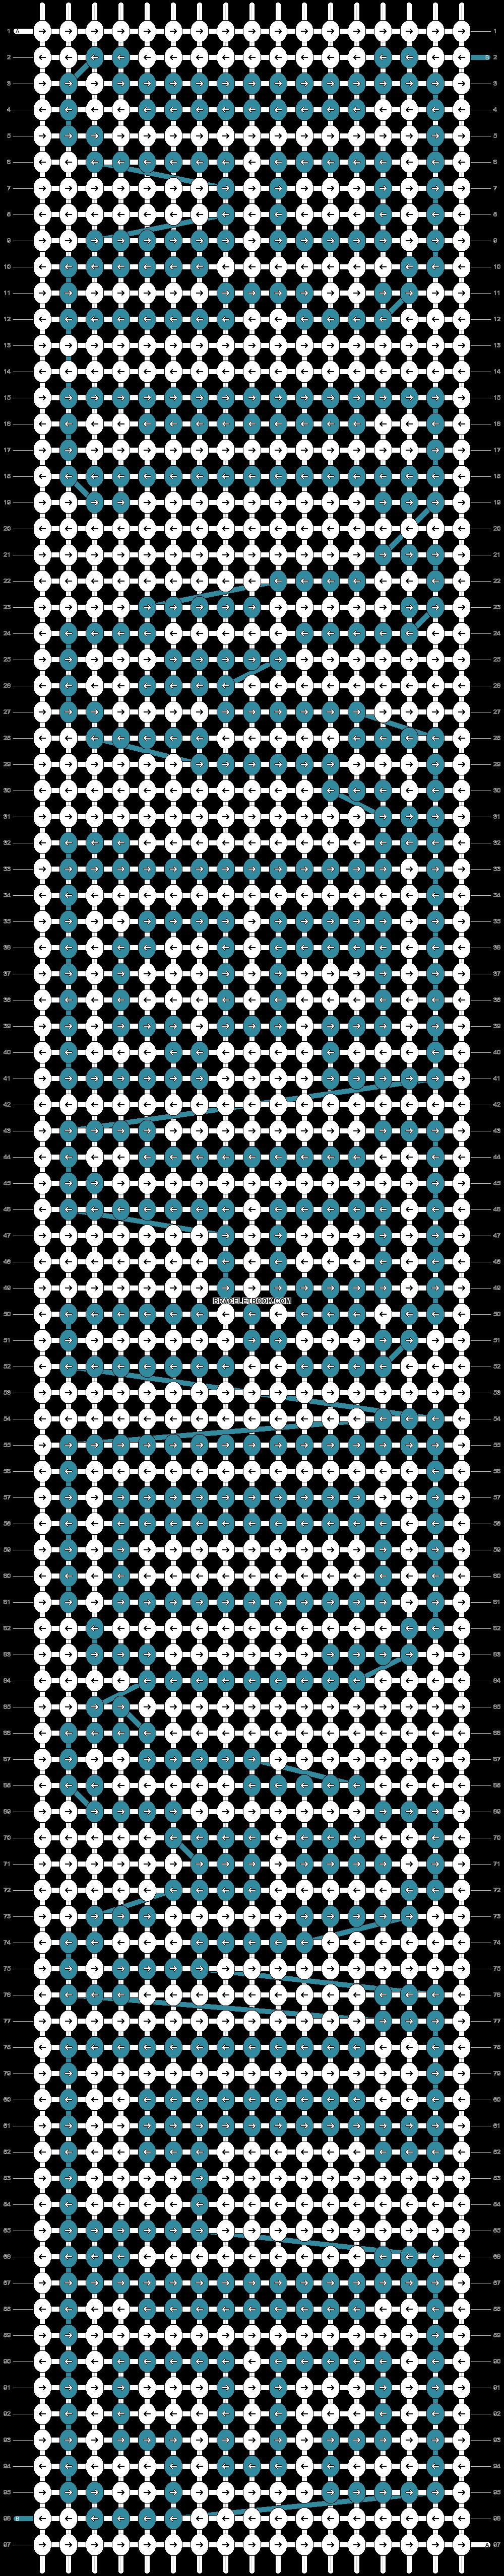 Alpha Pattern #22467 added by BrittanyXO